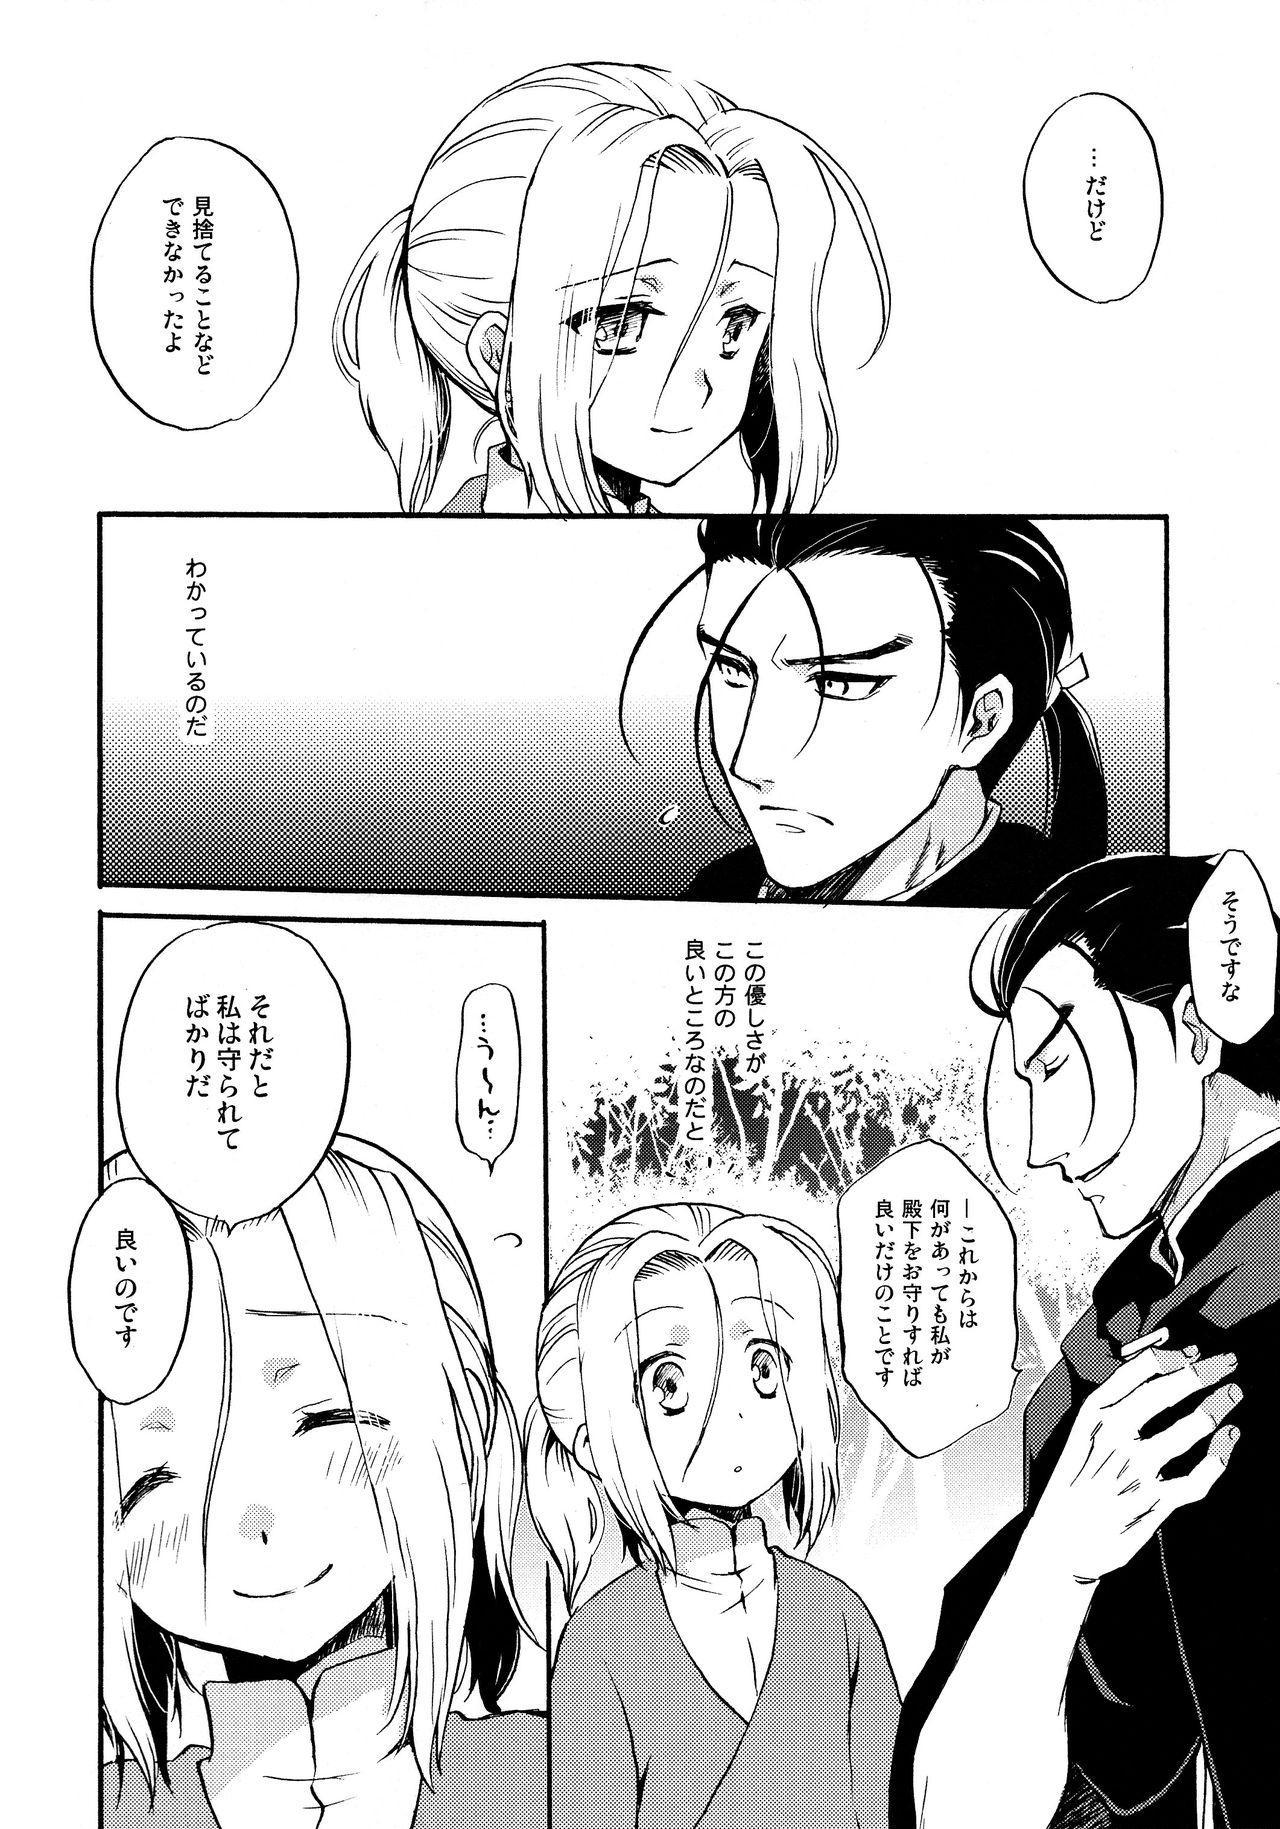 Denka no Gohoubi! 2